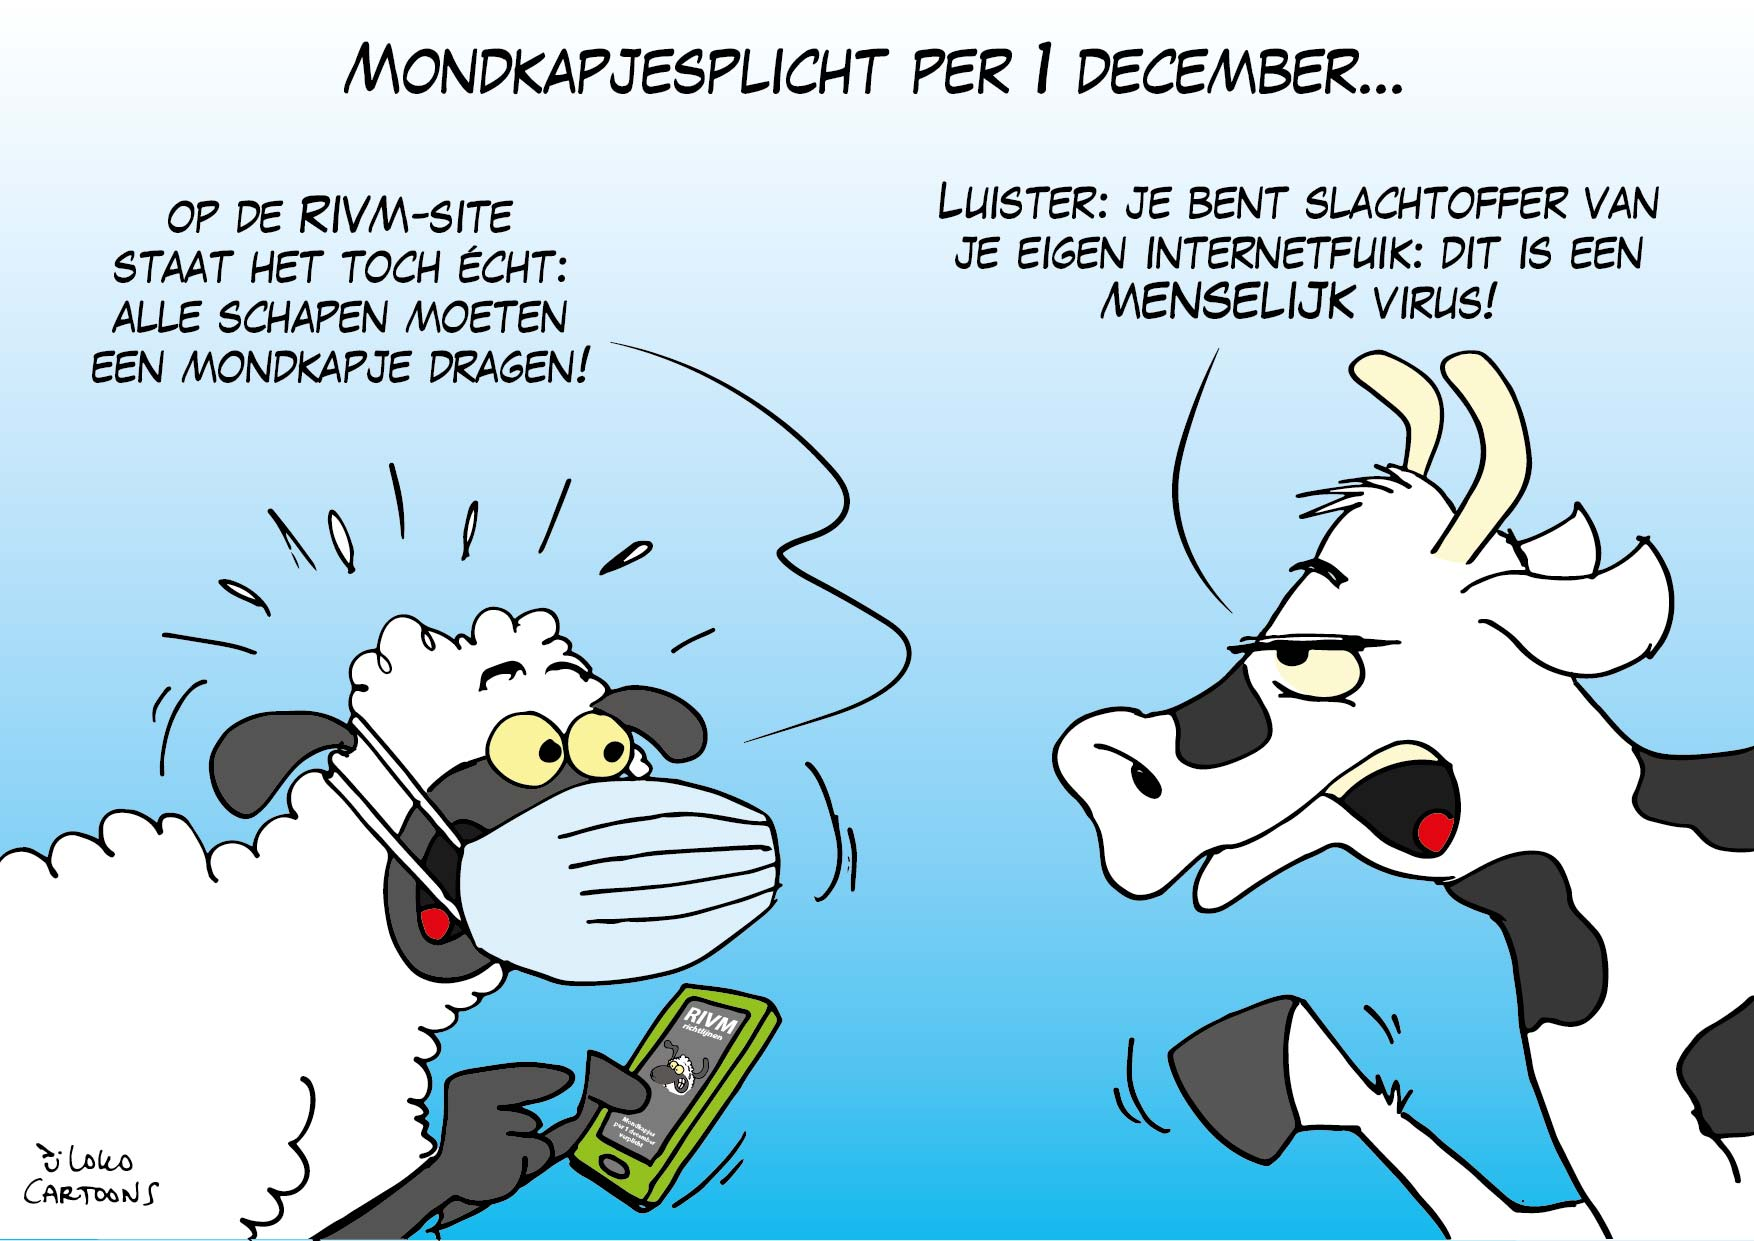 Mondkapjesplicht per 1 december